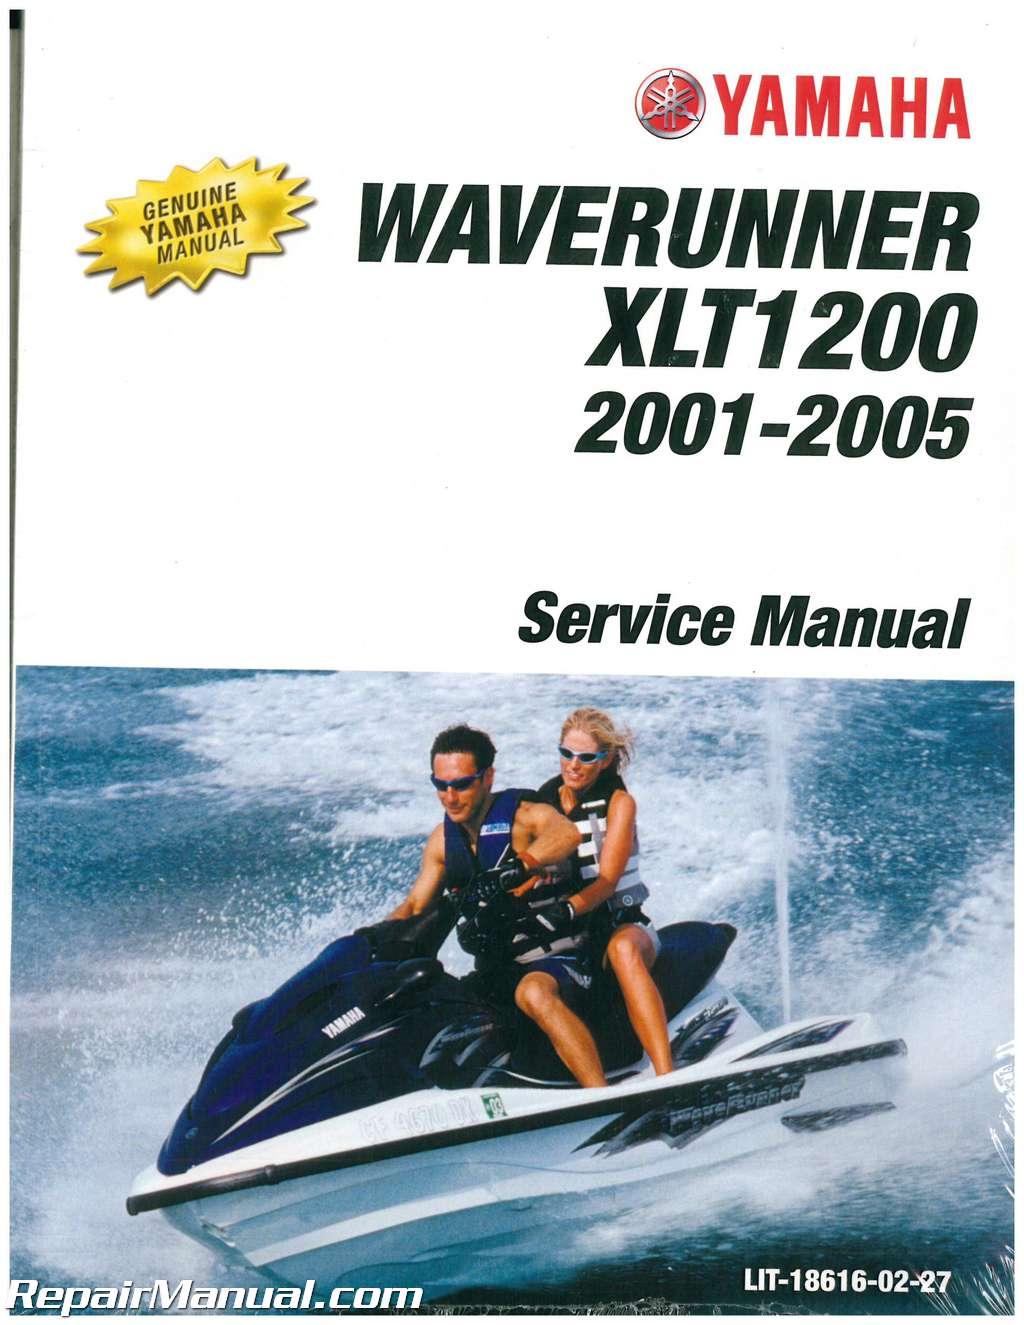 2001 2005 yamaha xlt1200 waverunner service manual rh repairmanual com 2002 Yamaha XLT 1200 Specs 2001 Yamaha Jet Ski